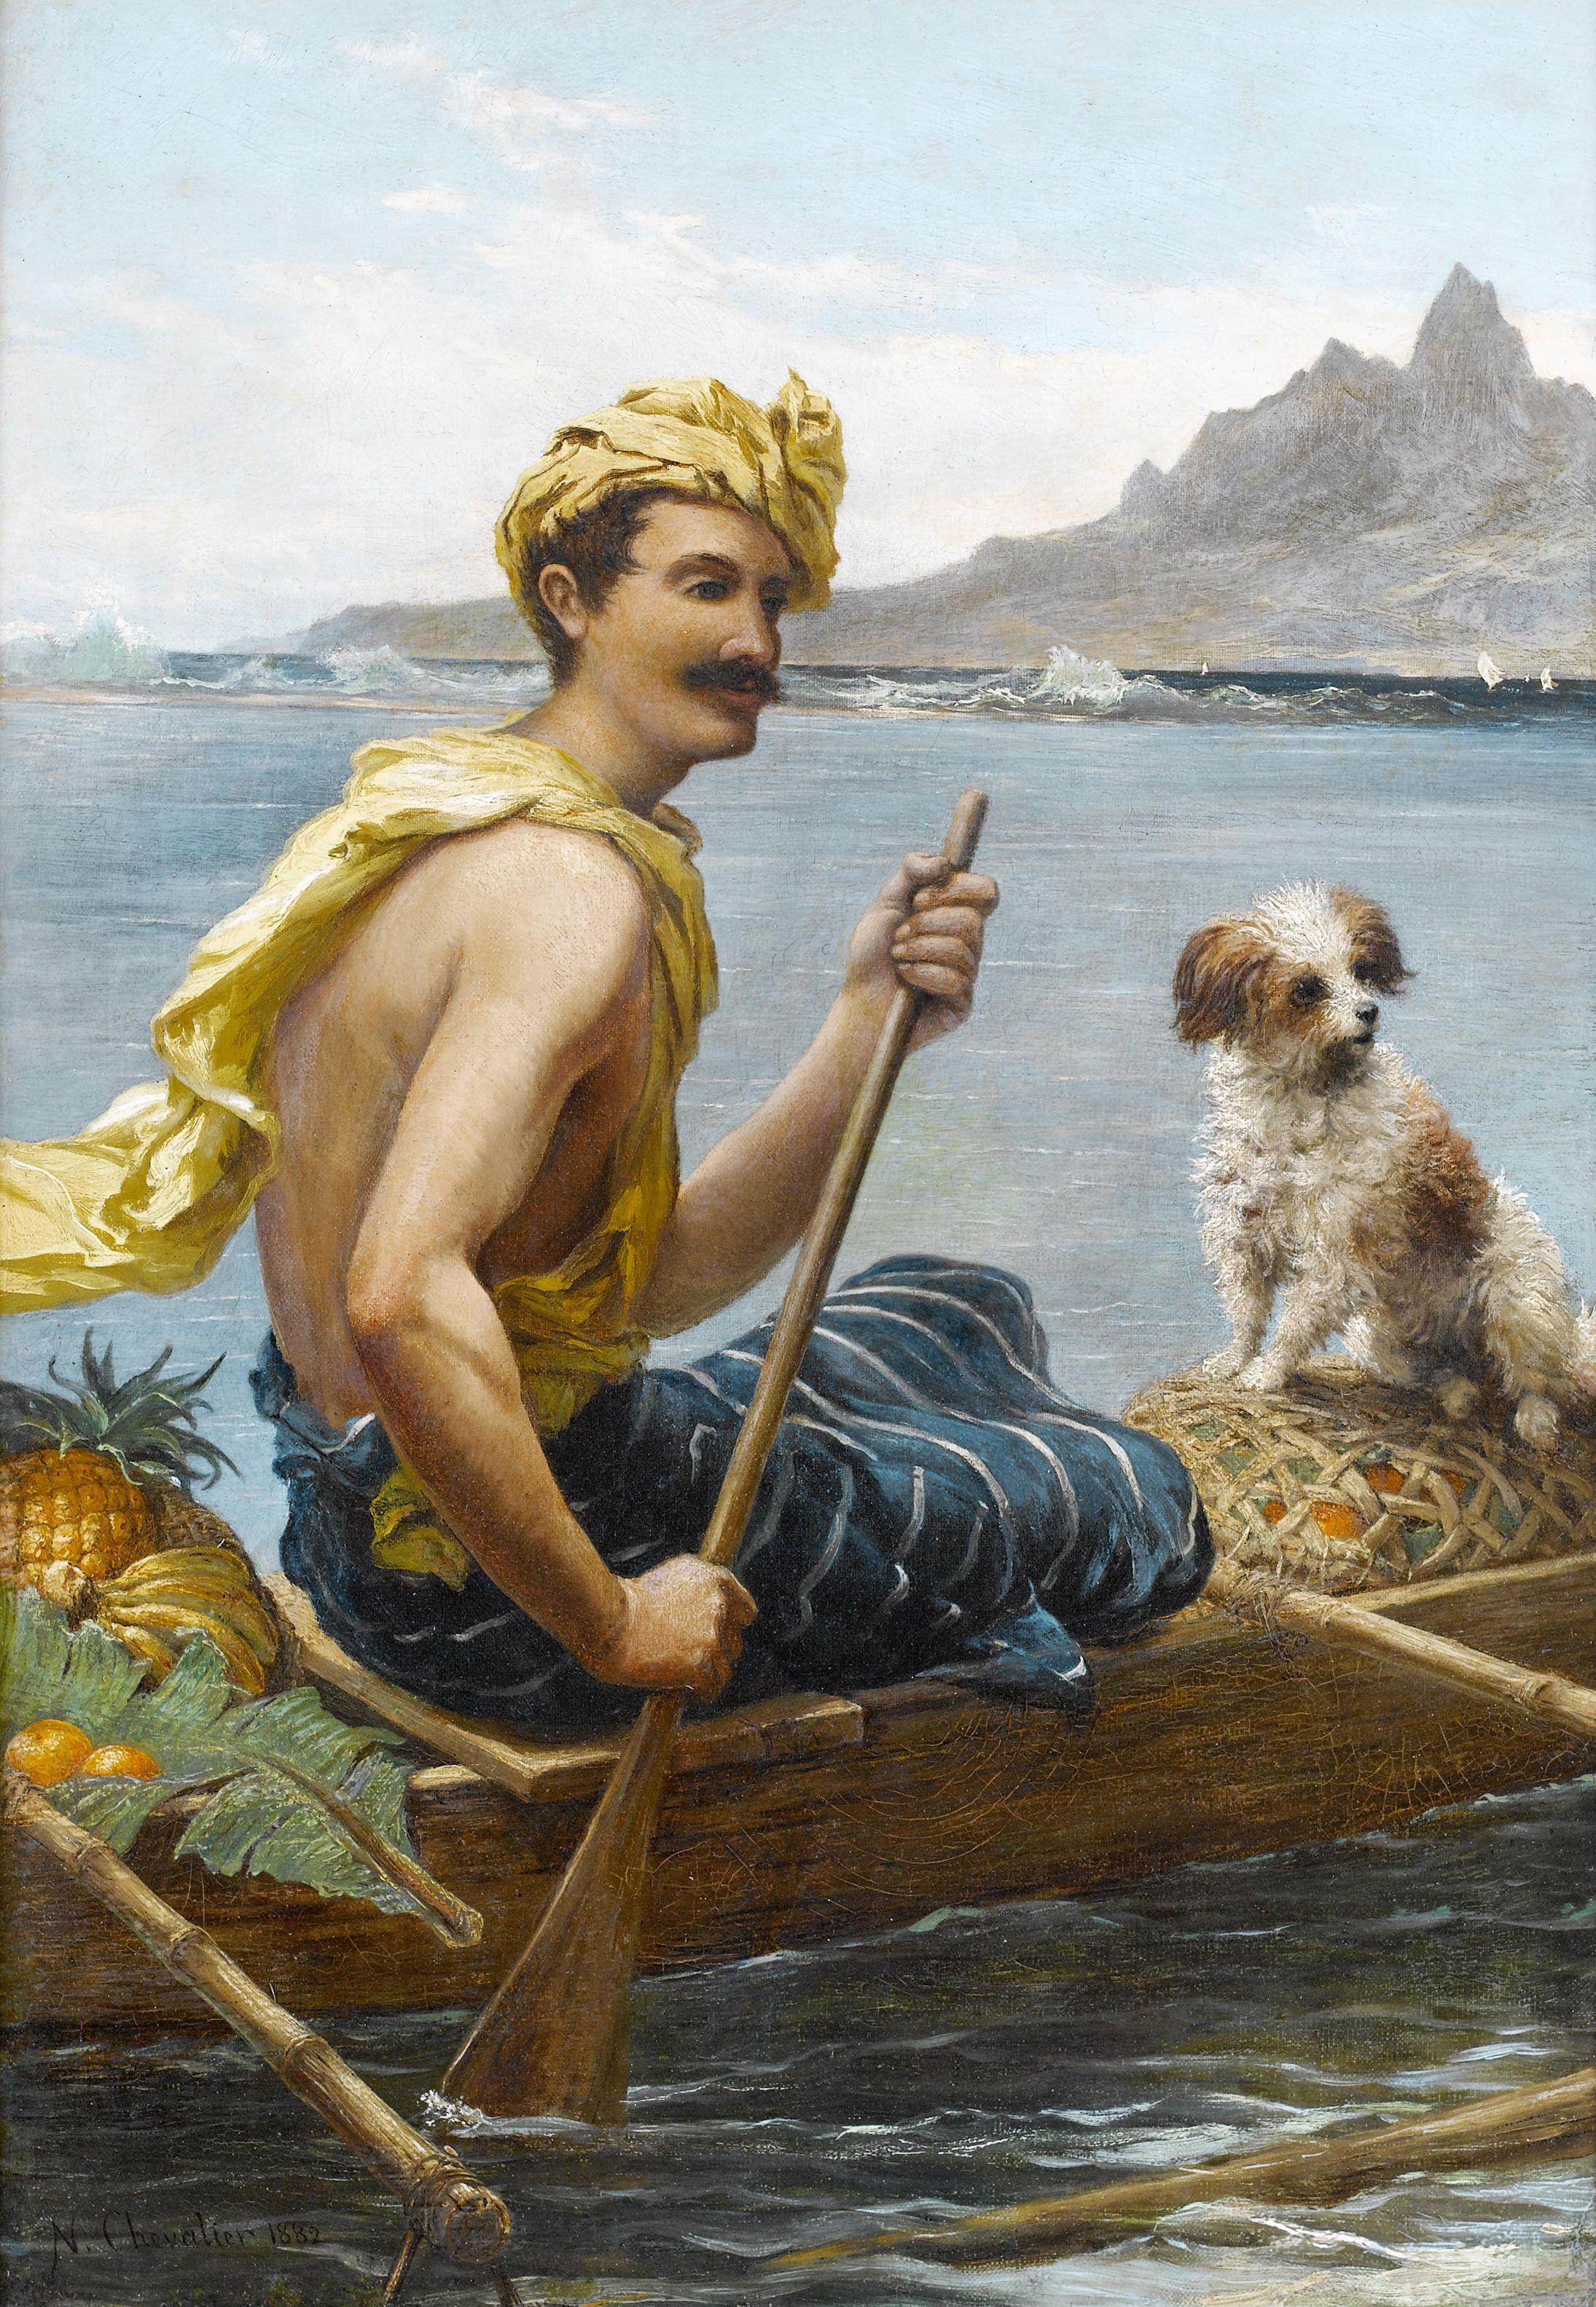 Nicholas Chevalier, Arcadia, South Sea Islands, 1882, oil on canvas.jpg